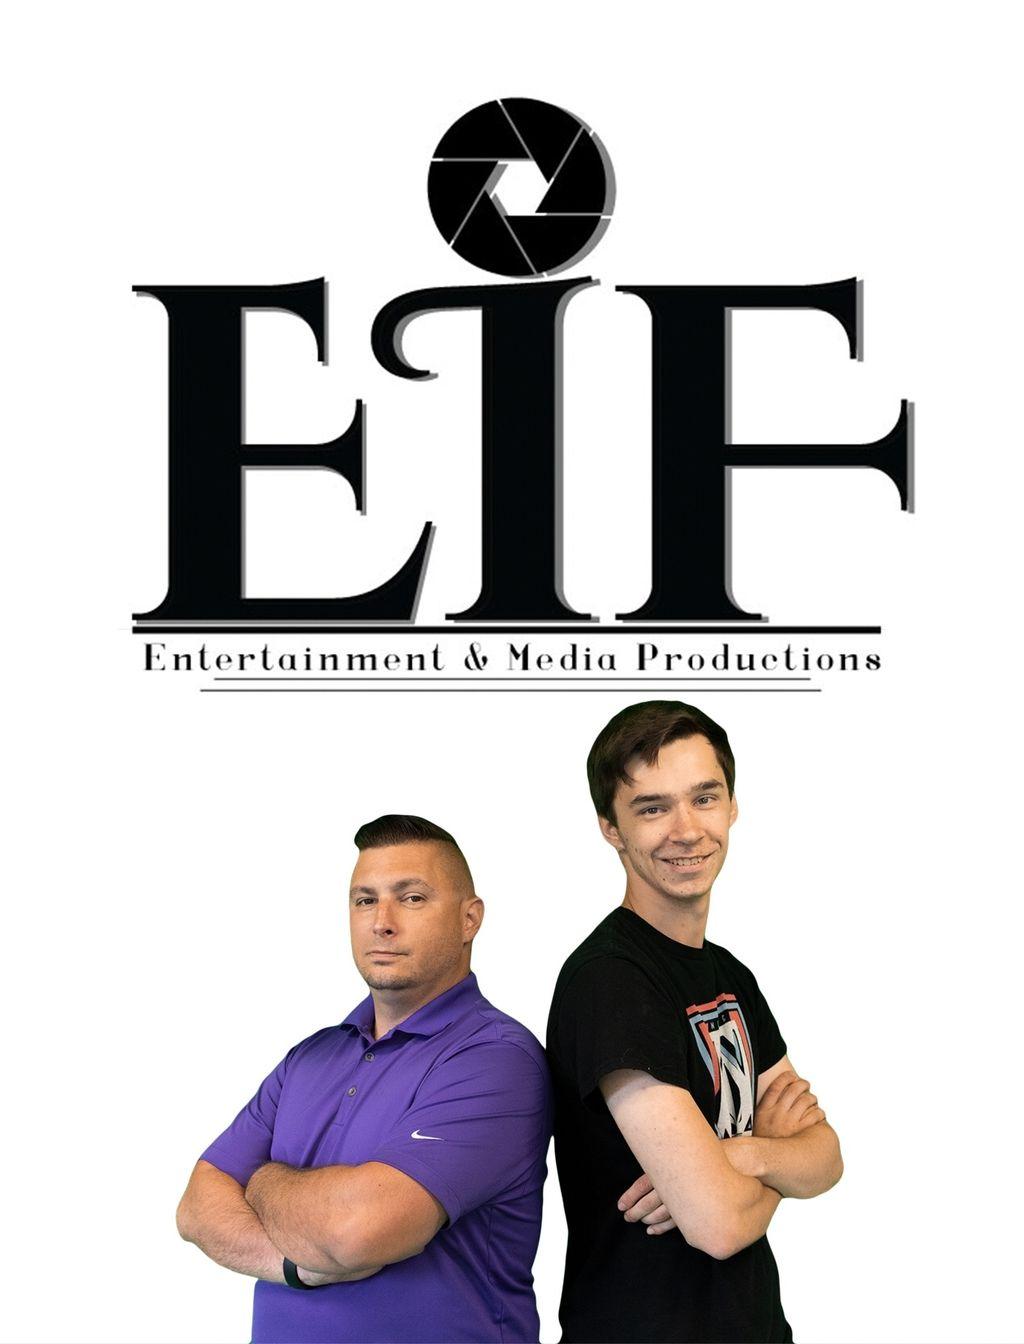 E.I.F. Entertainment&Media Productions LLC